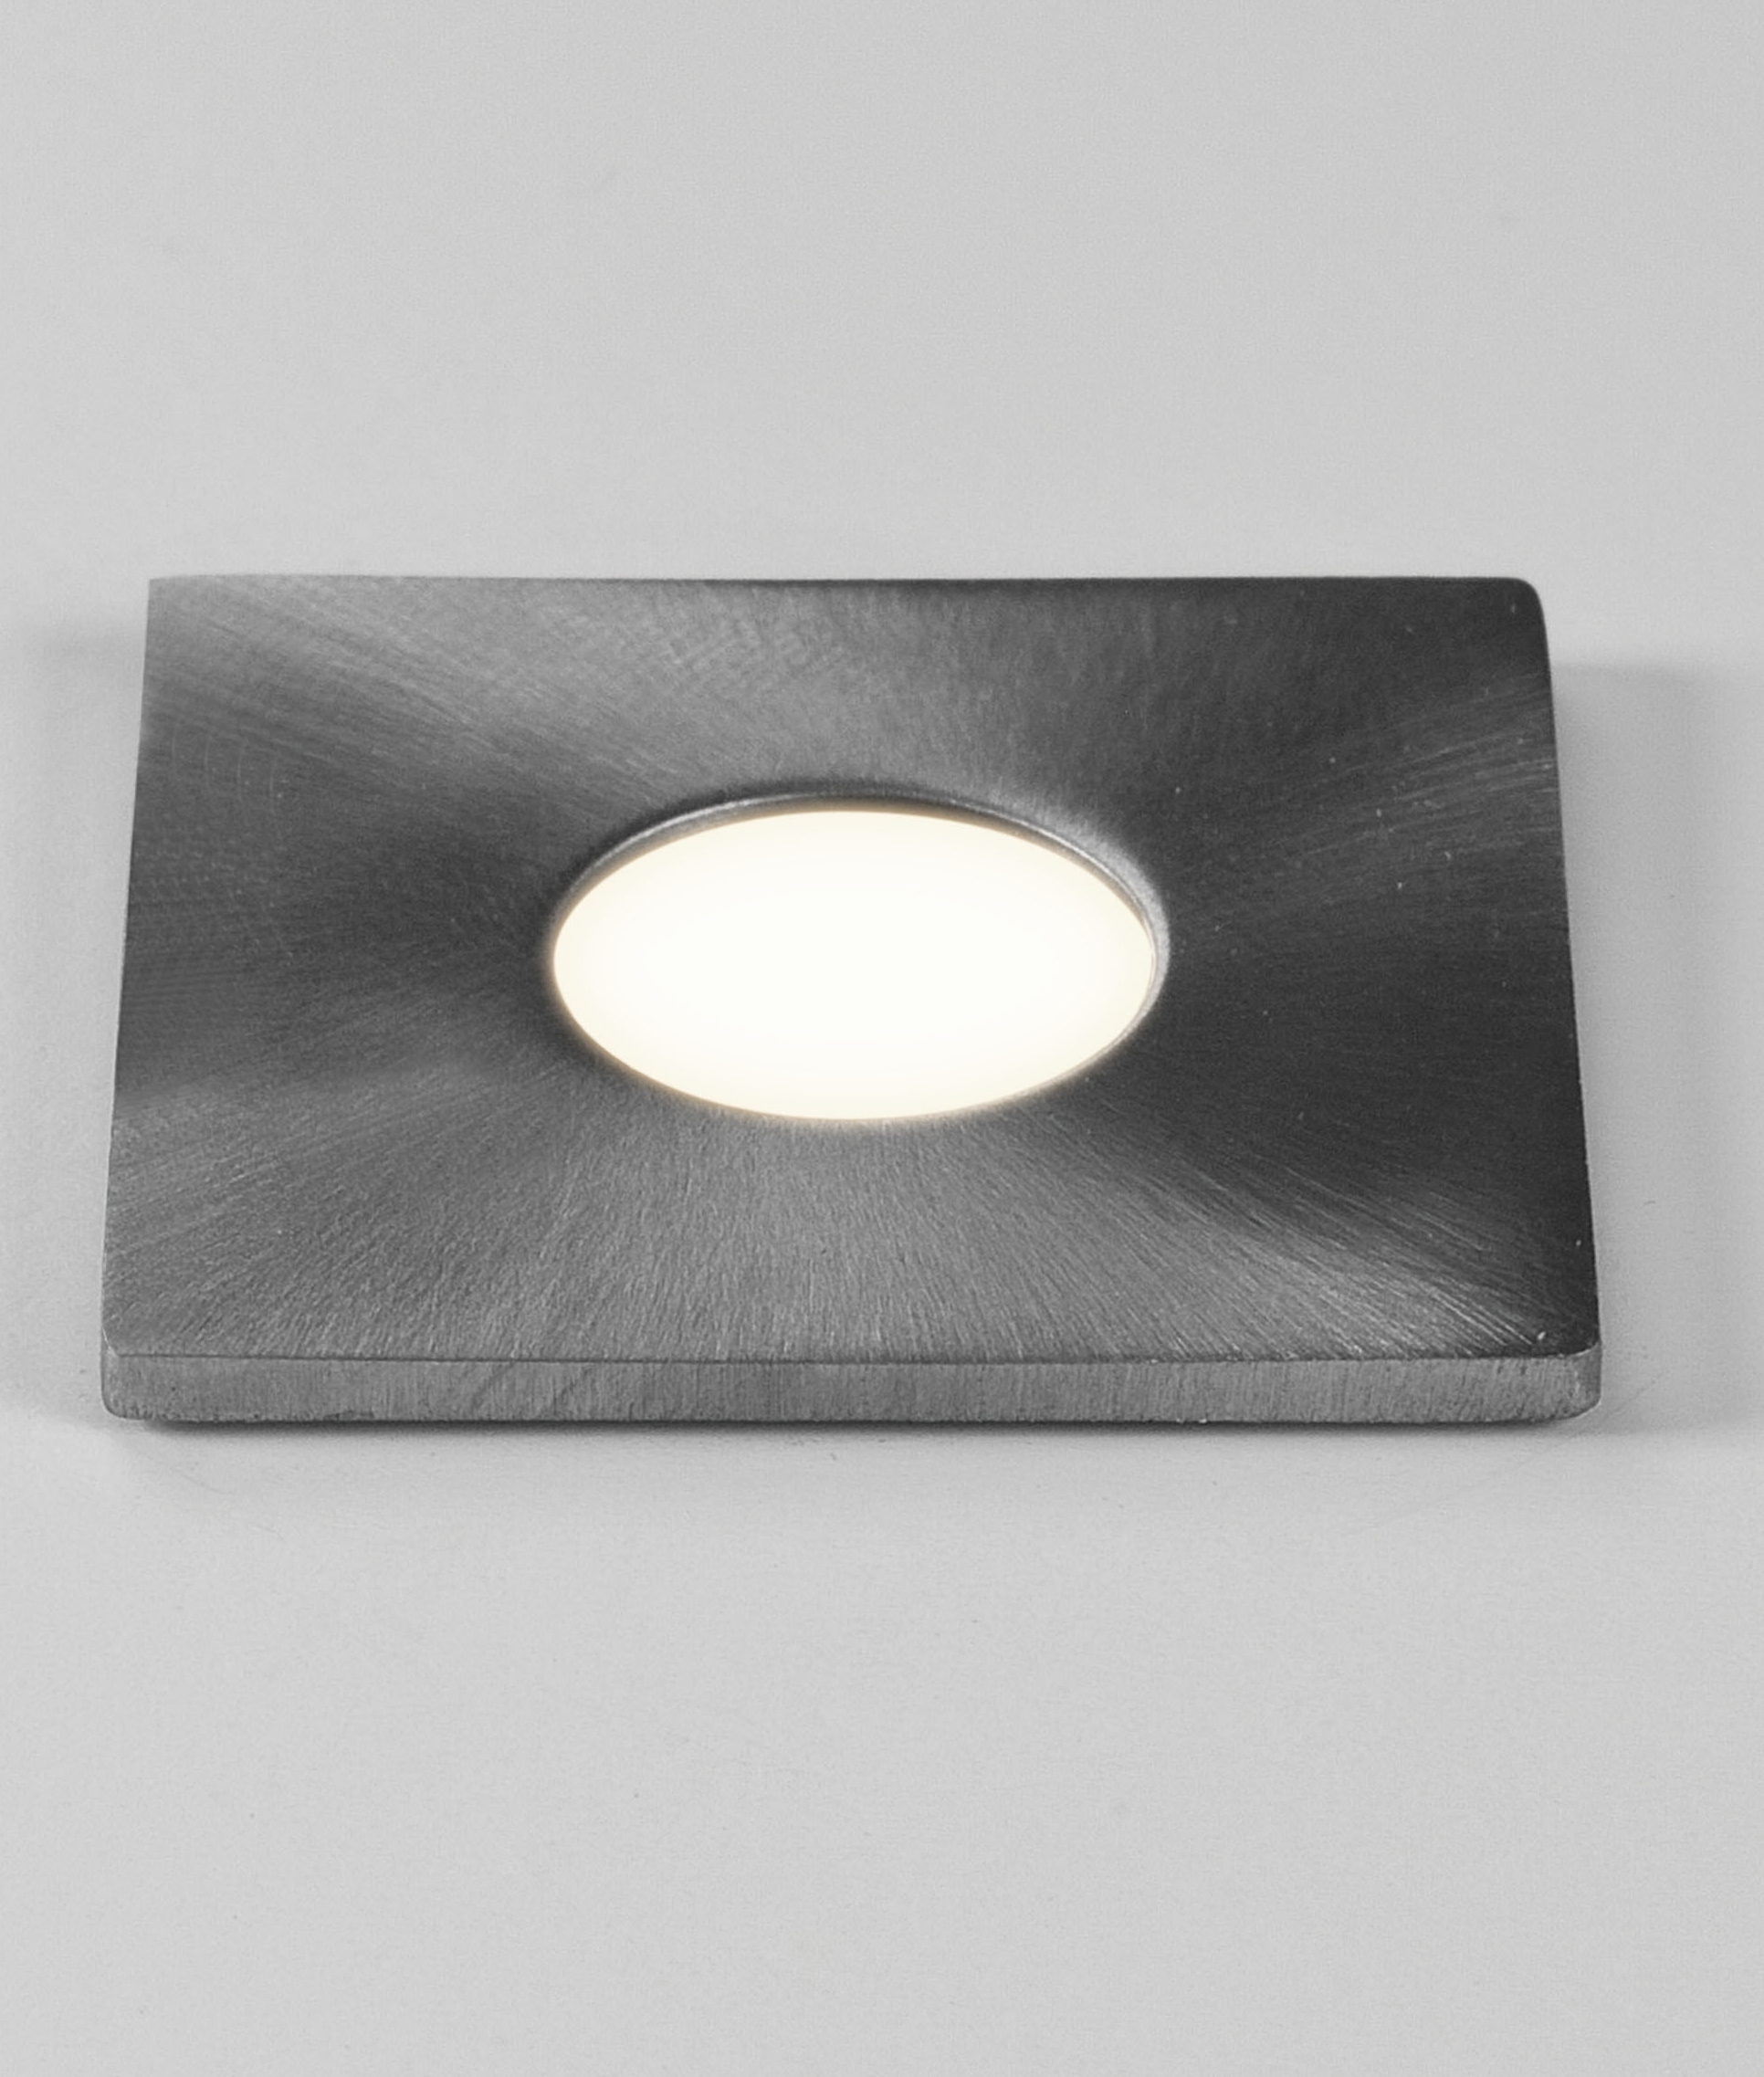 Small Discreet Brushed Steel IP65 LED Light